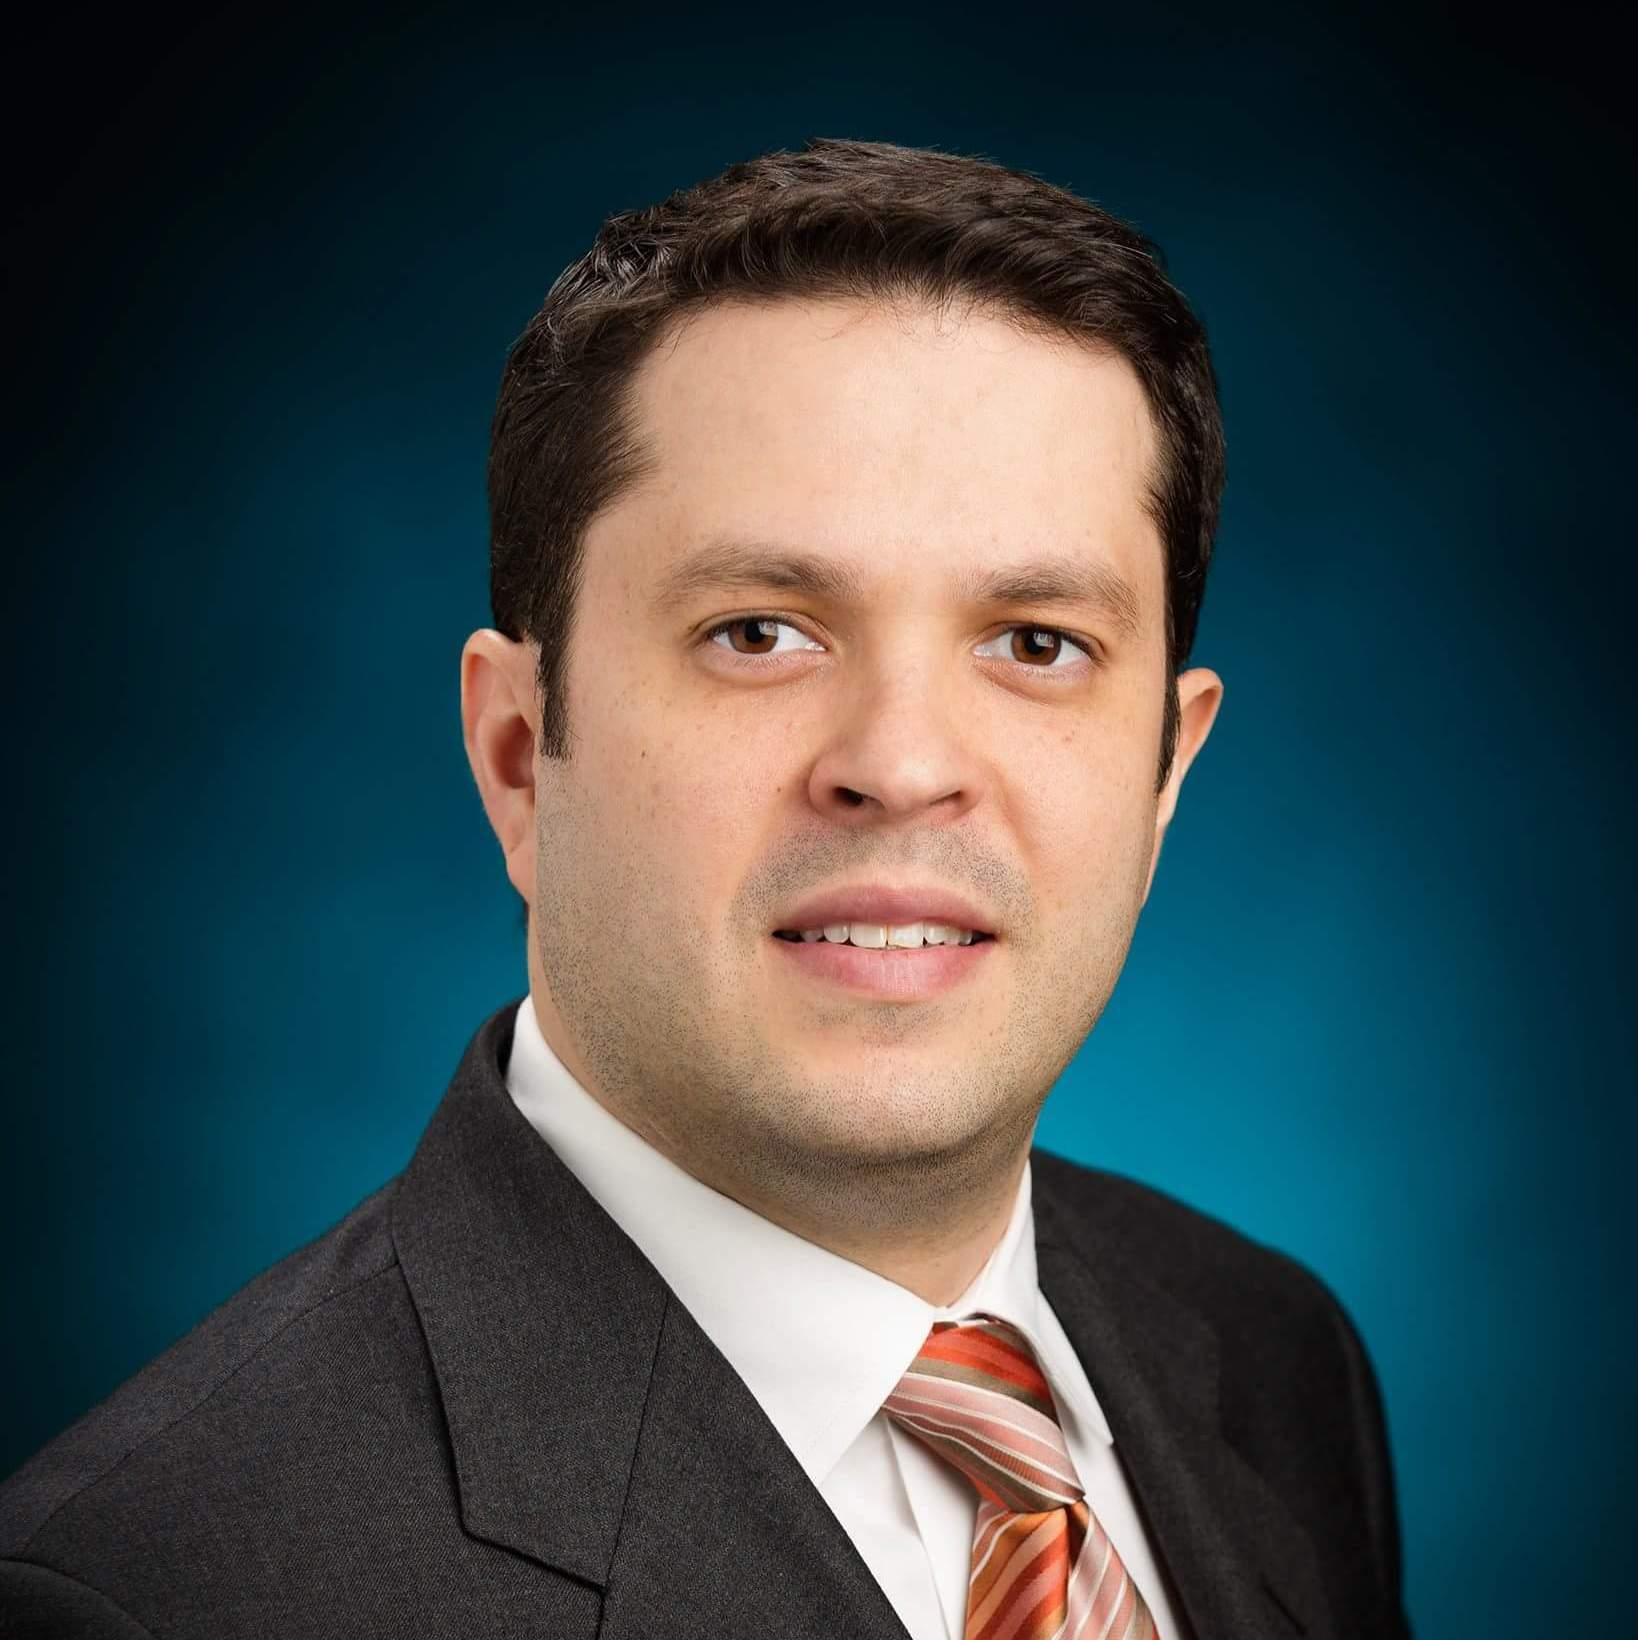 Victor Barnica